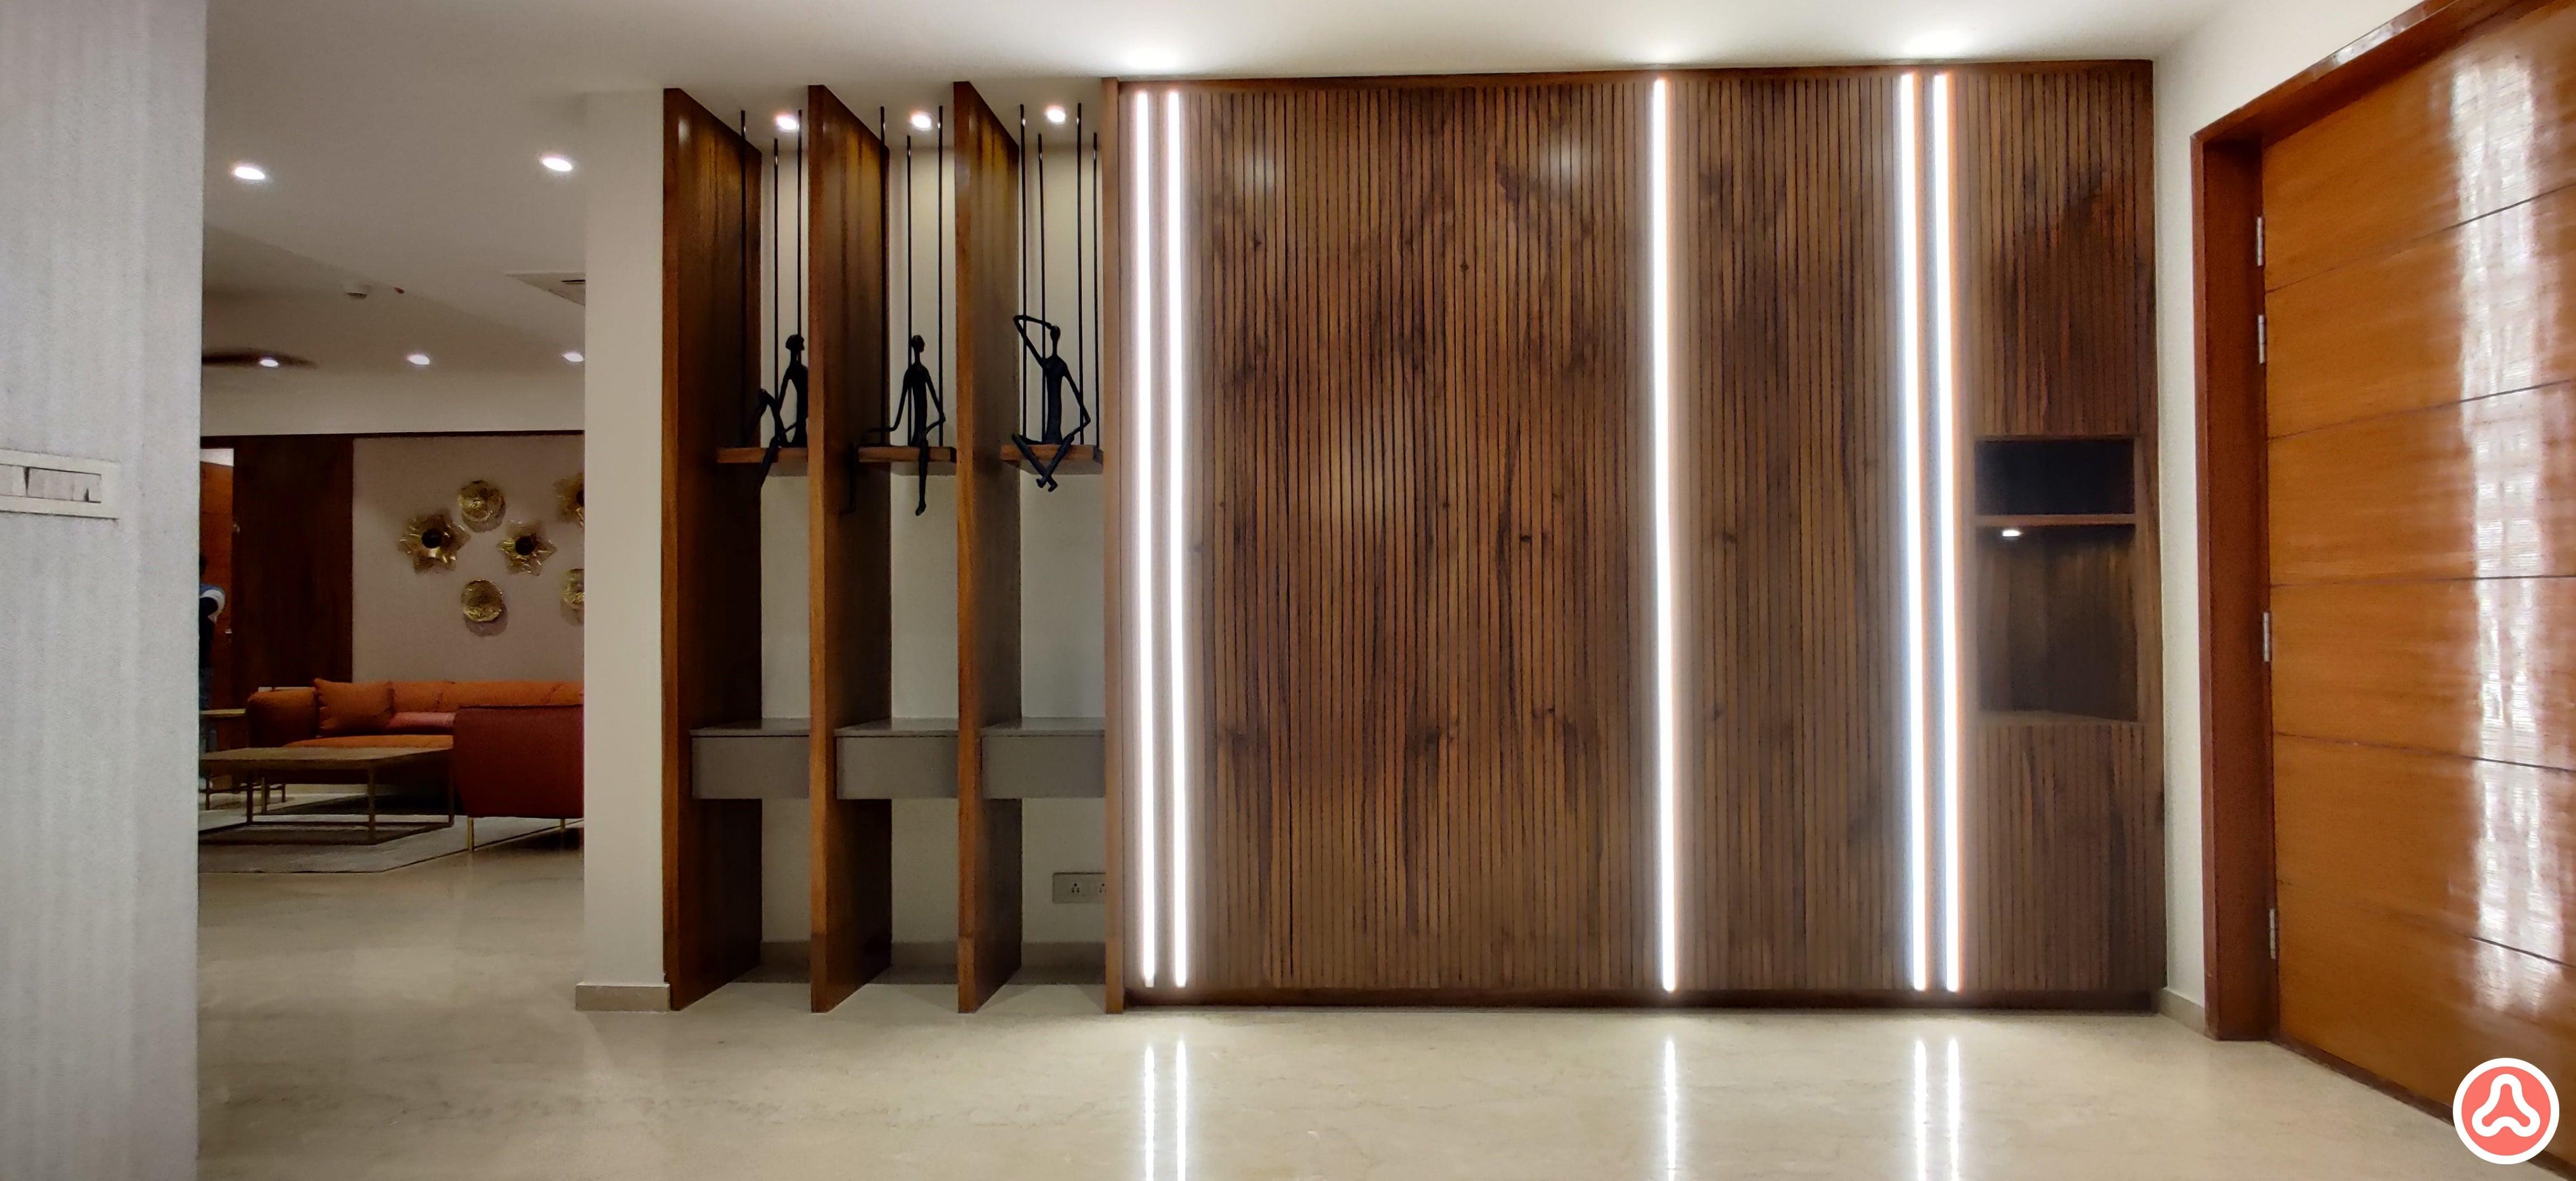 Display wall unit designs